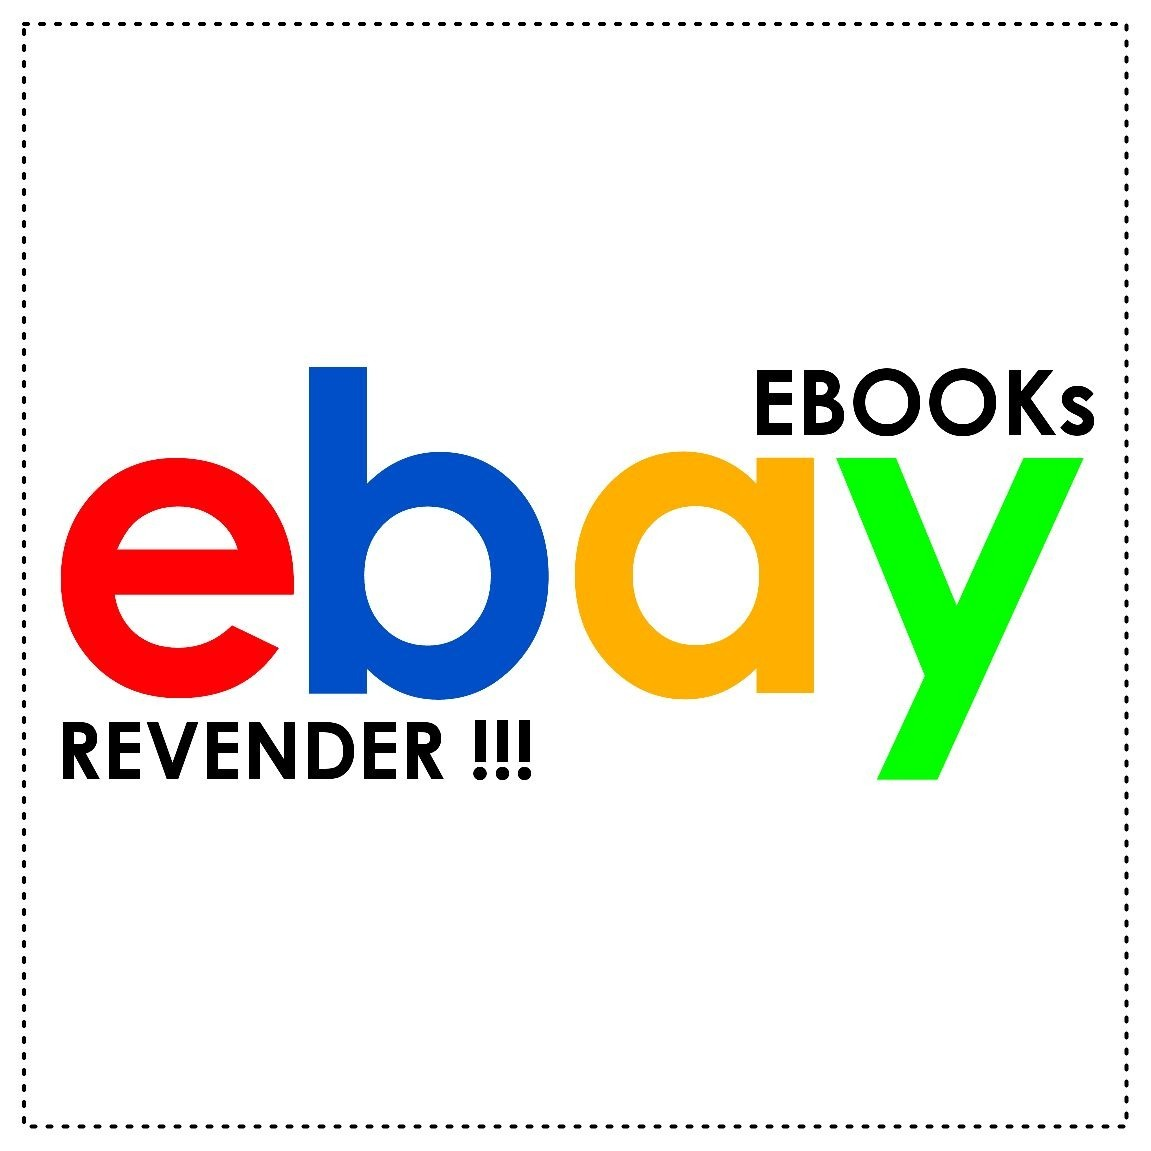 Ebay Ebooks